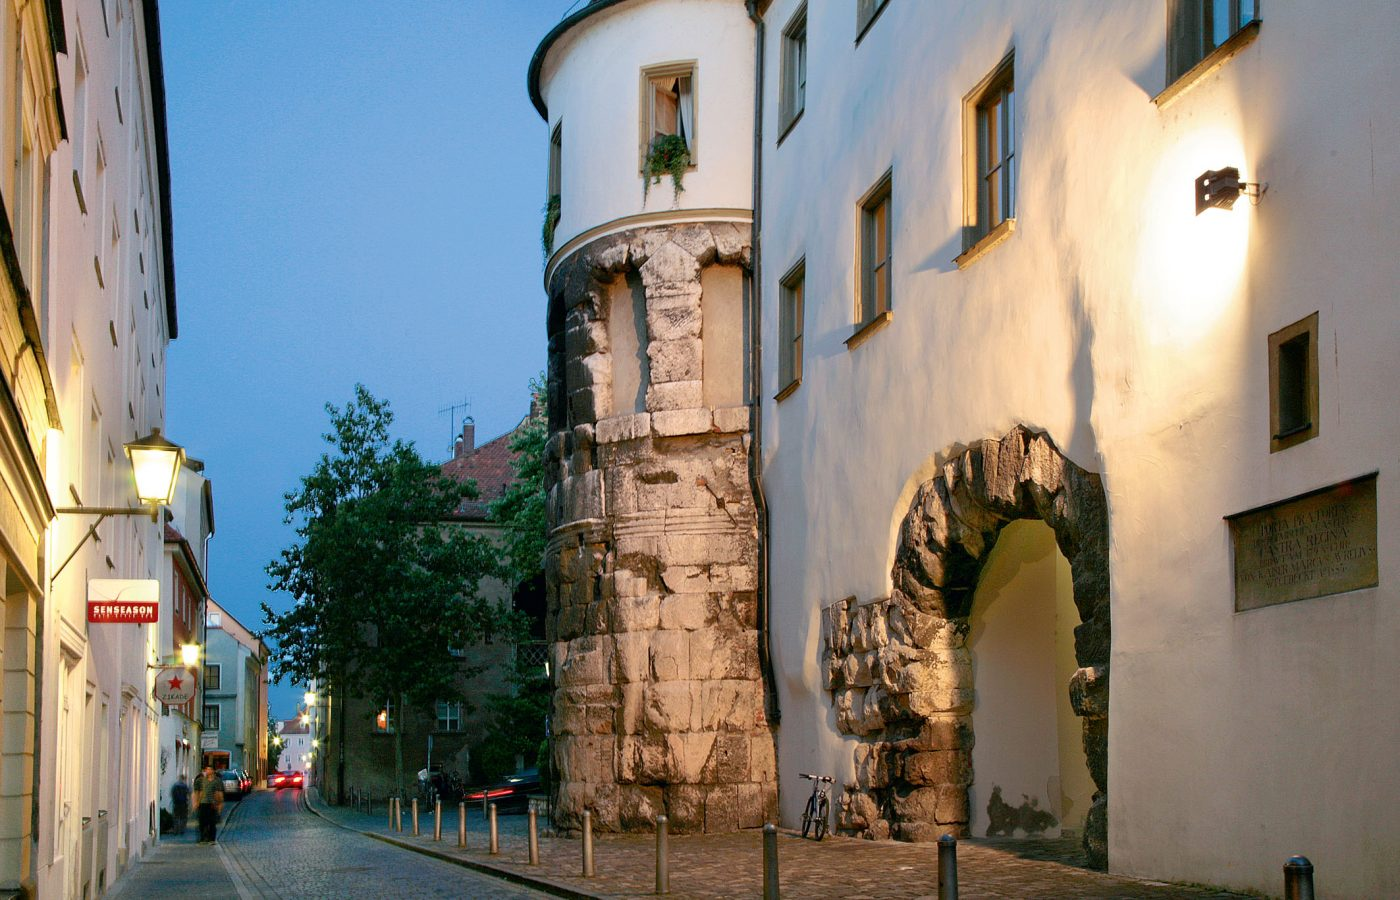 hotel_bad_abbach_ausflugsziel_regensburg_porta_praetoria